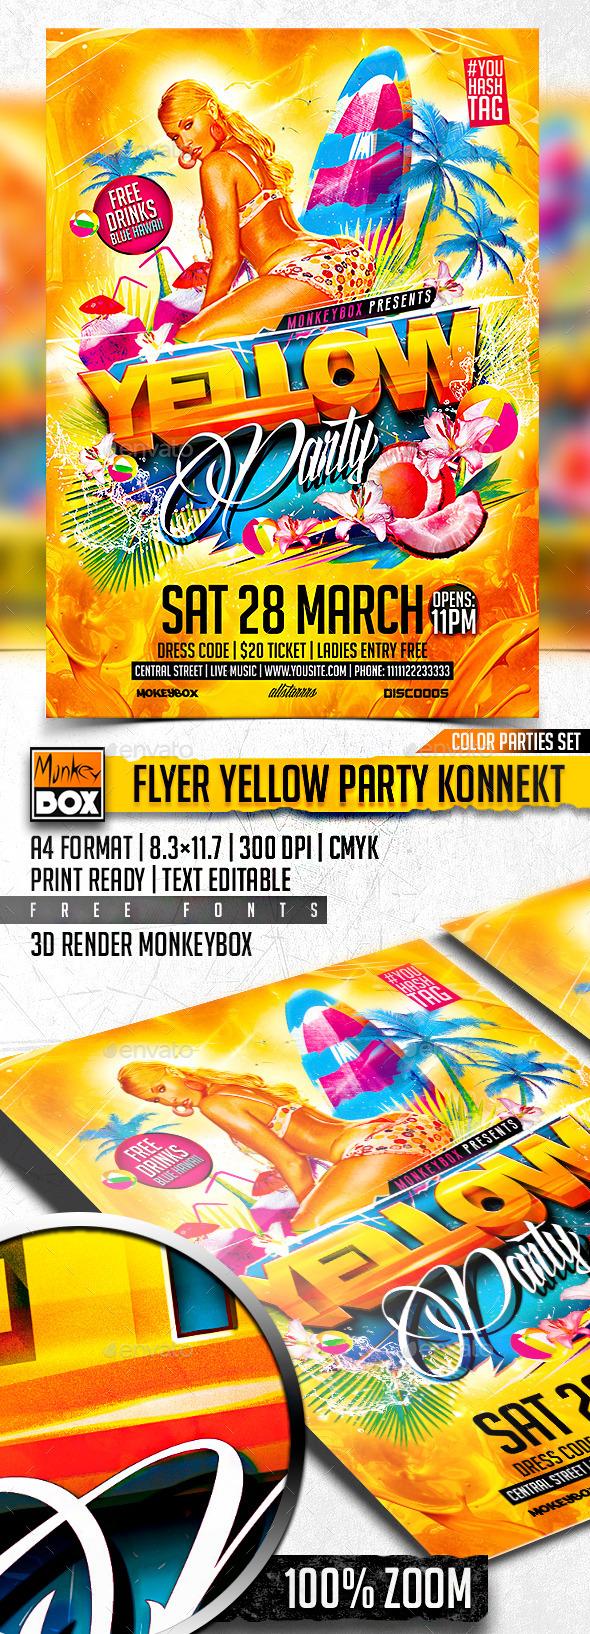 GraphicRiver Flyer Yellow Party Konnekt 10881466